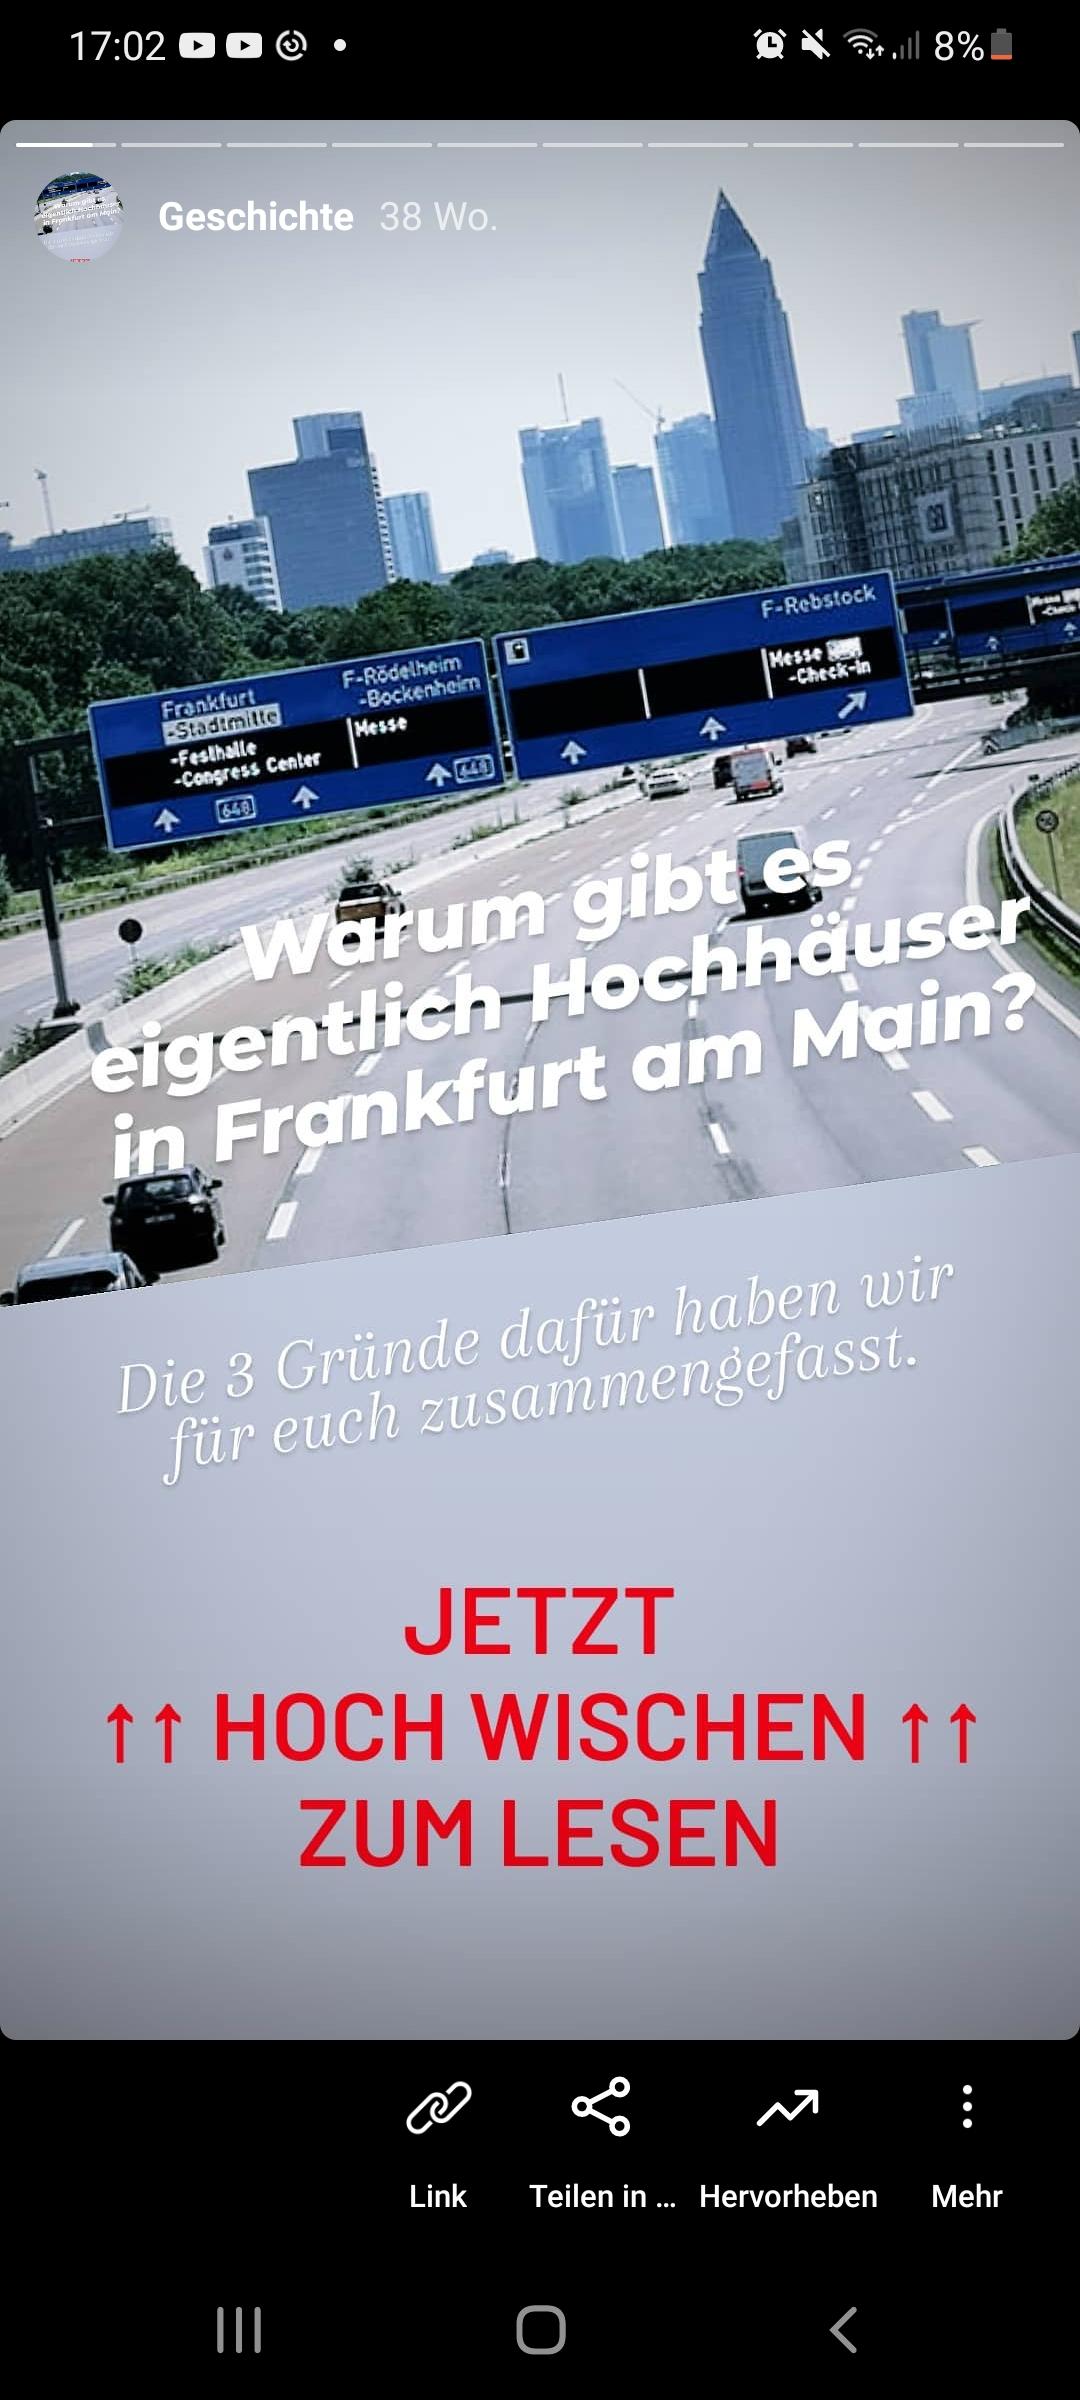 Frankfurt Instagram - Beste Frankfurt Instagram Kanäle - Frankfurt Skyline Instagram